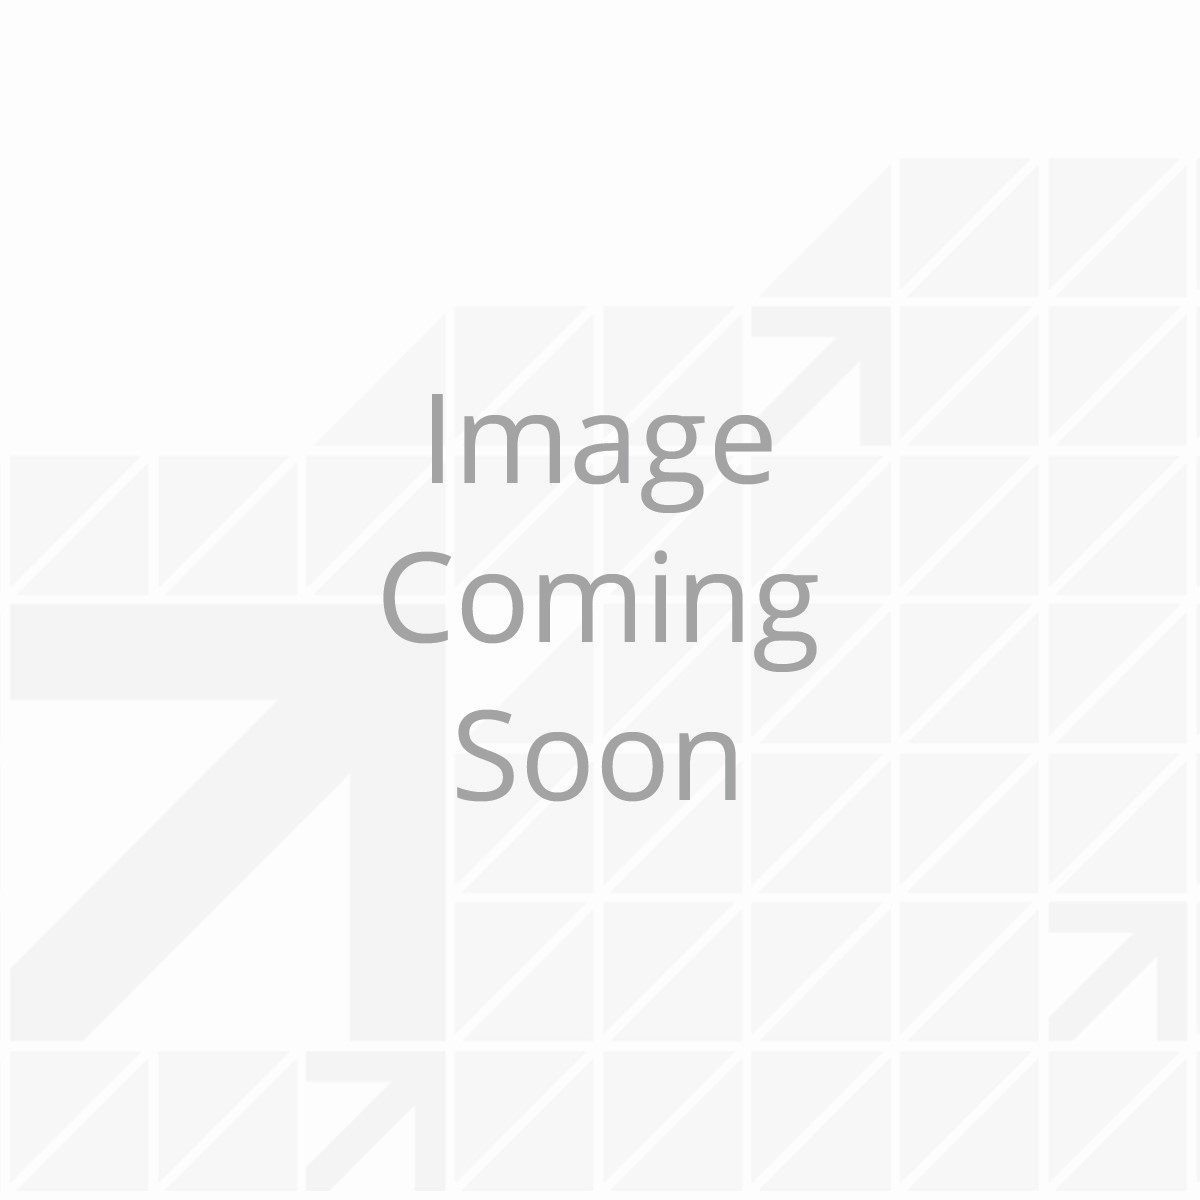 19' Power & Hybrid Awning Roller Assembly - Prepflex Sand Fade